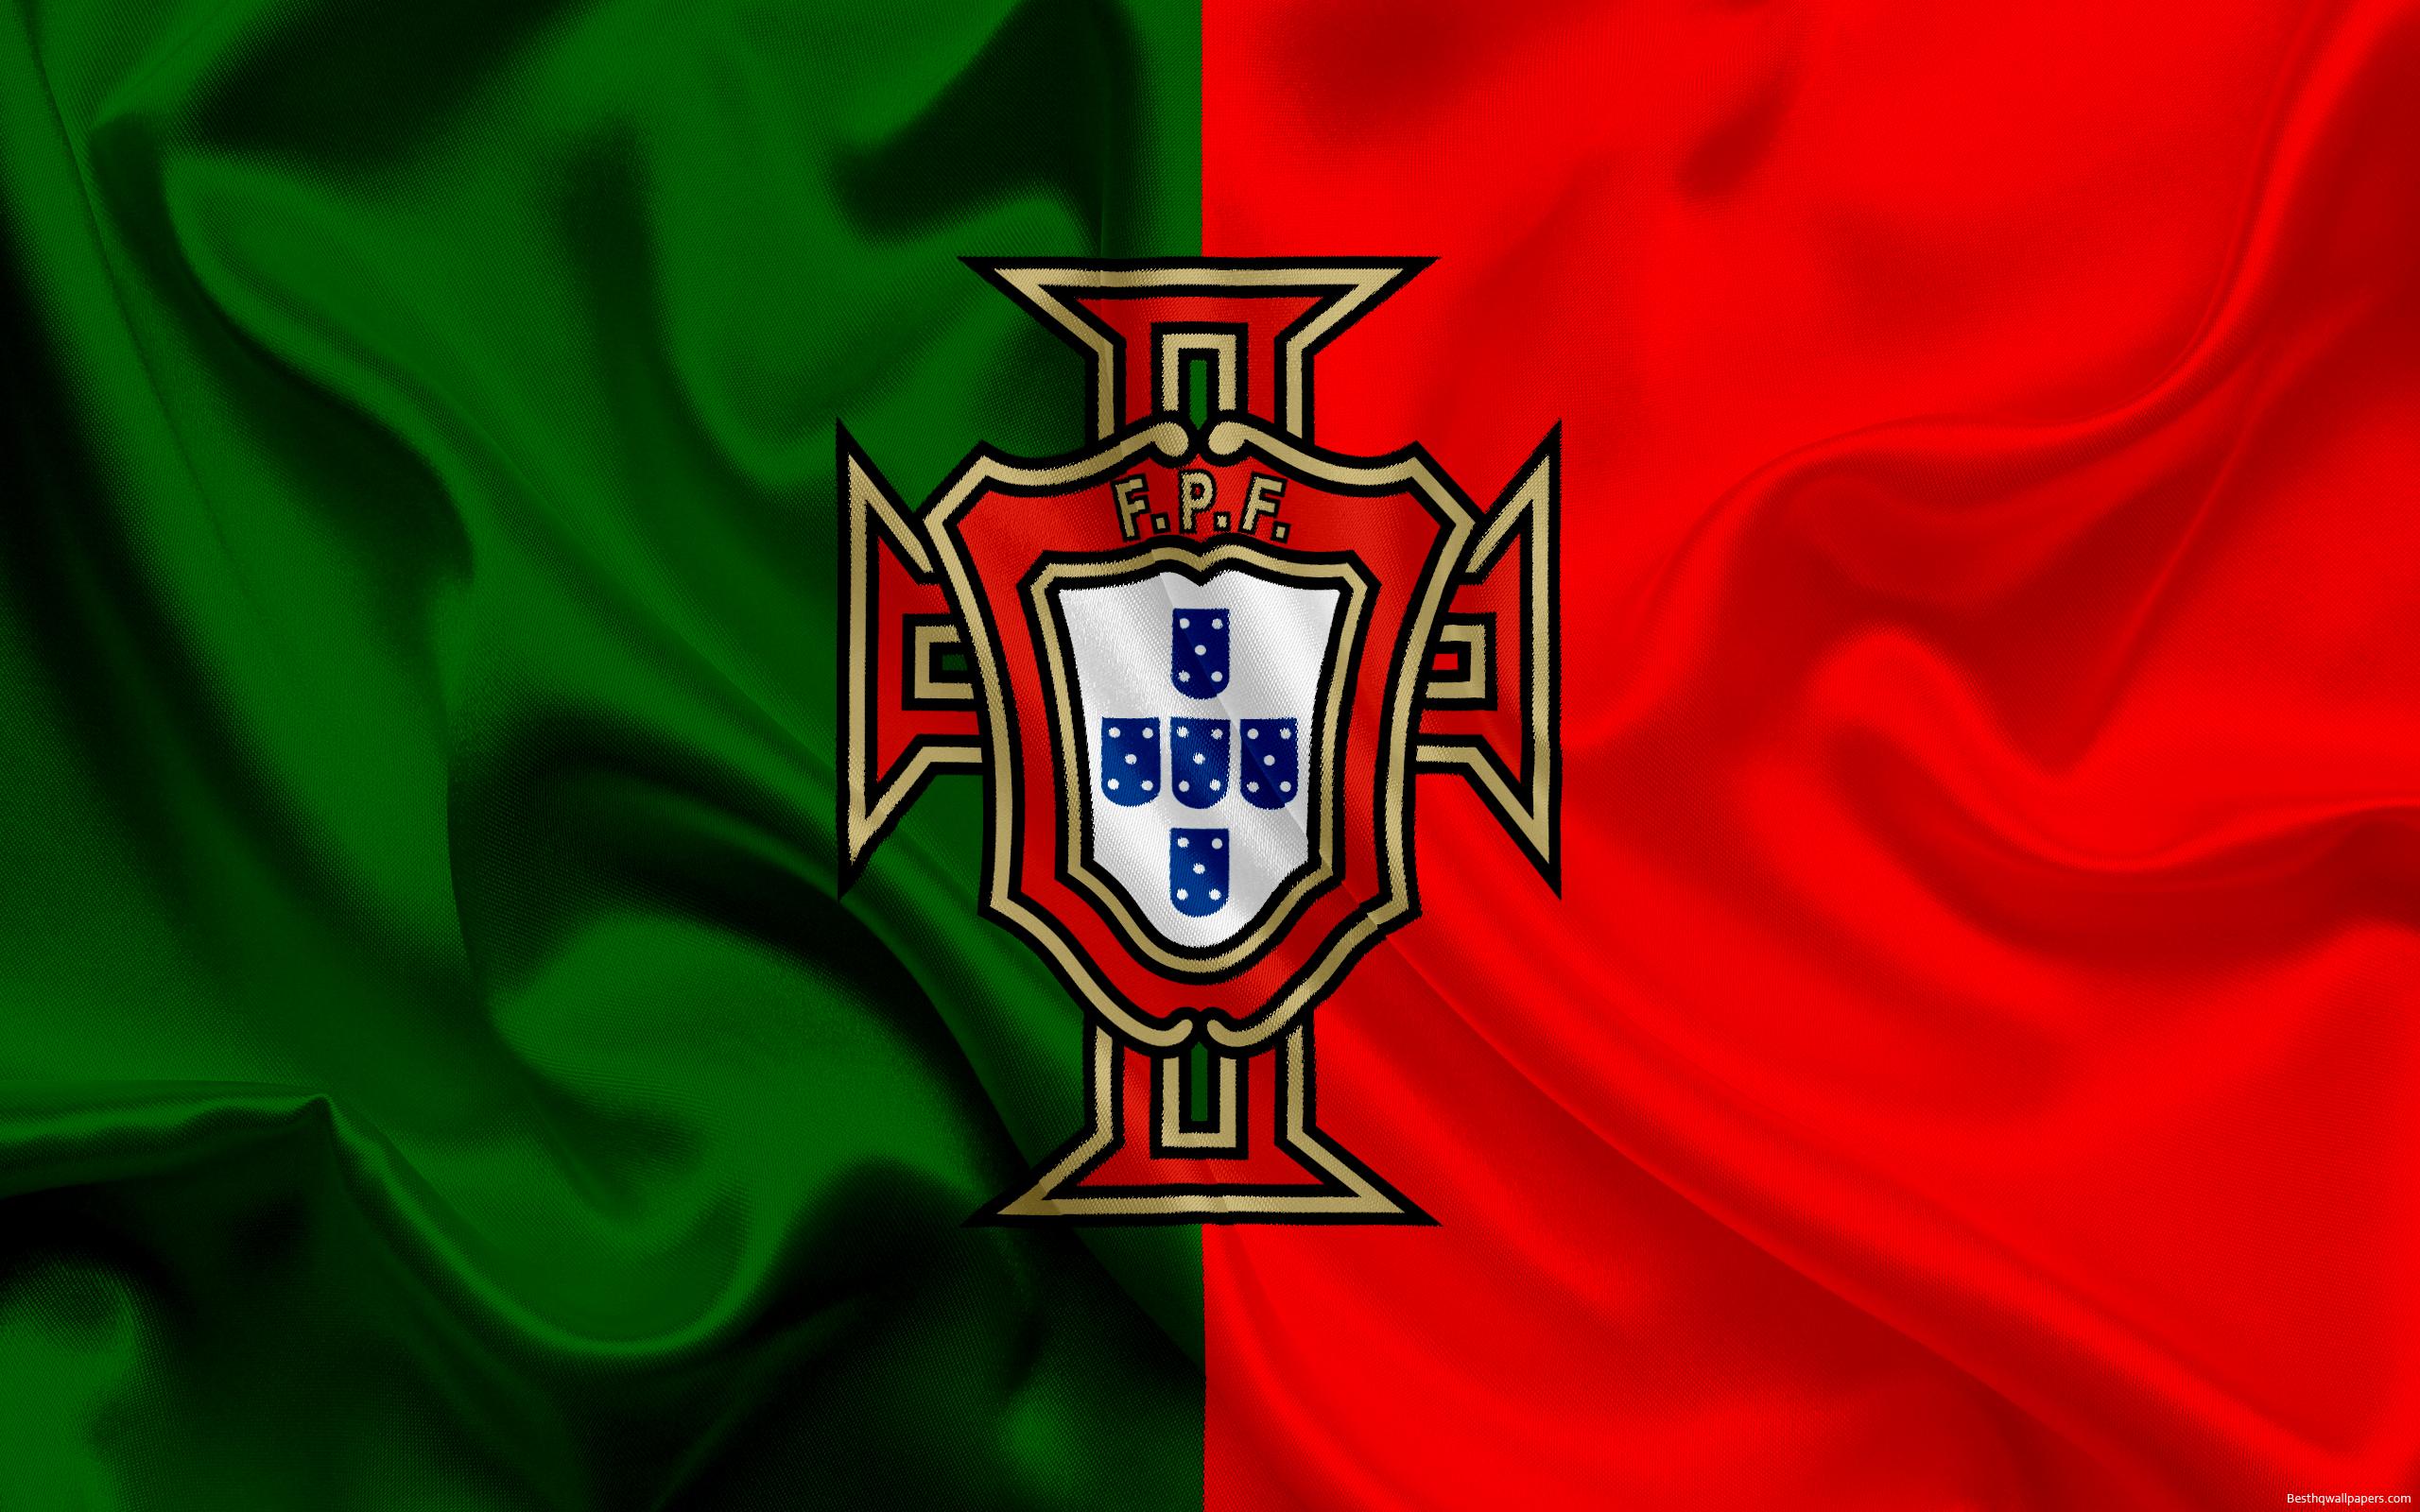 Download wallpapers Portugal national football team emblem logo 2560x1600